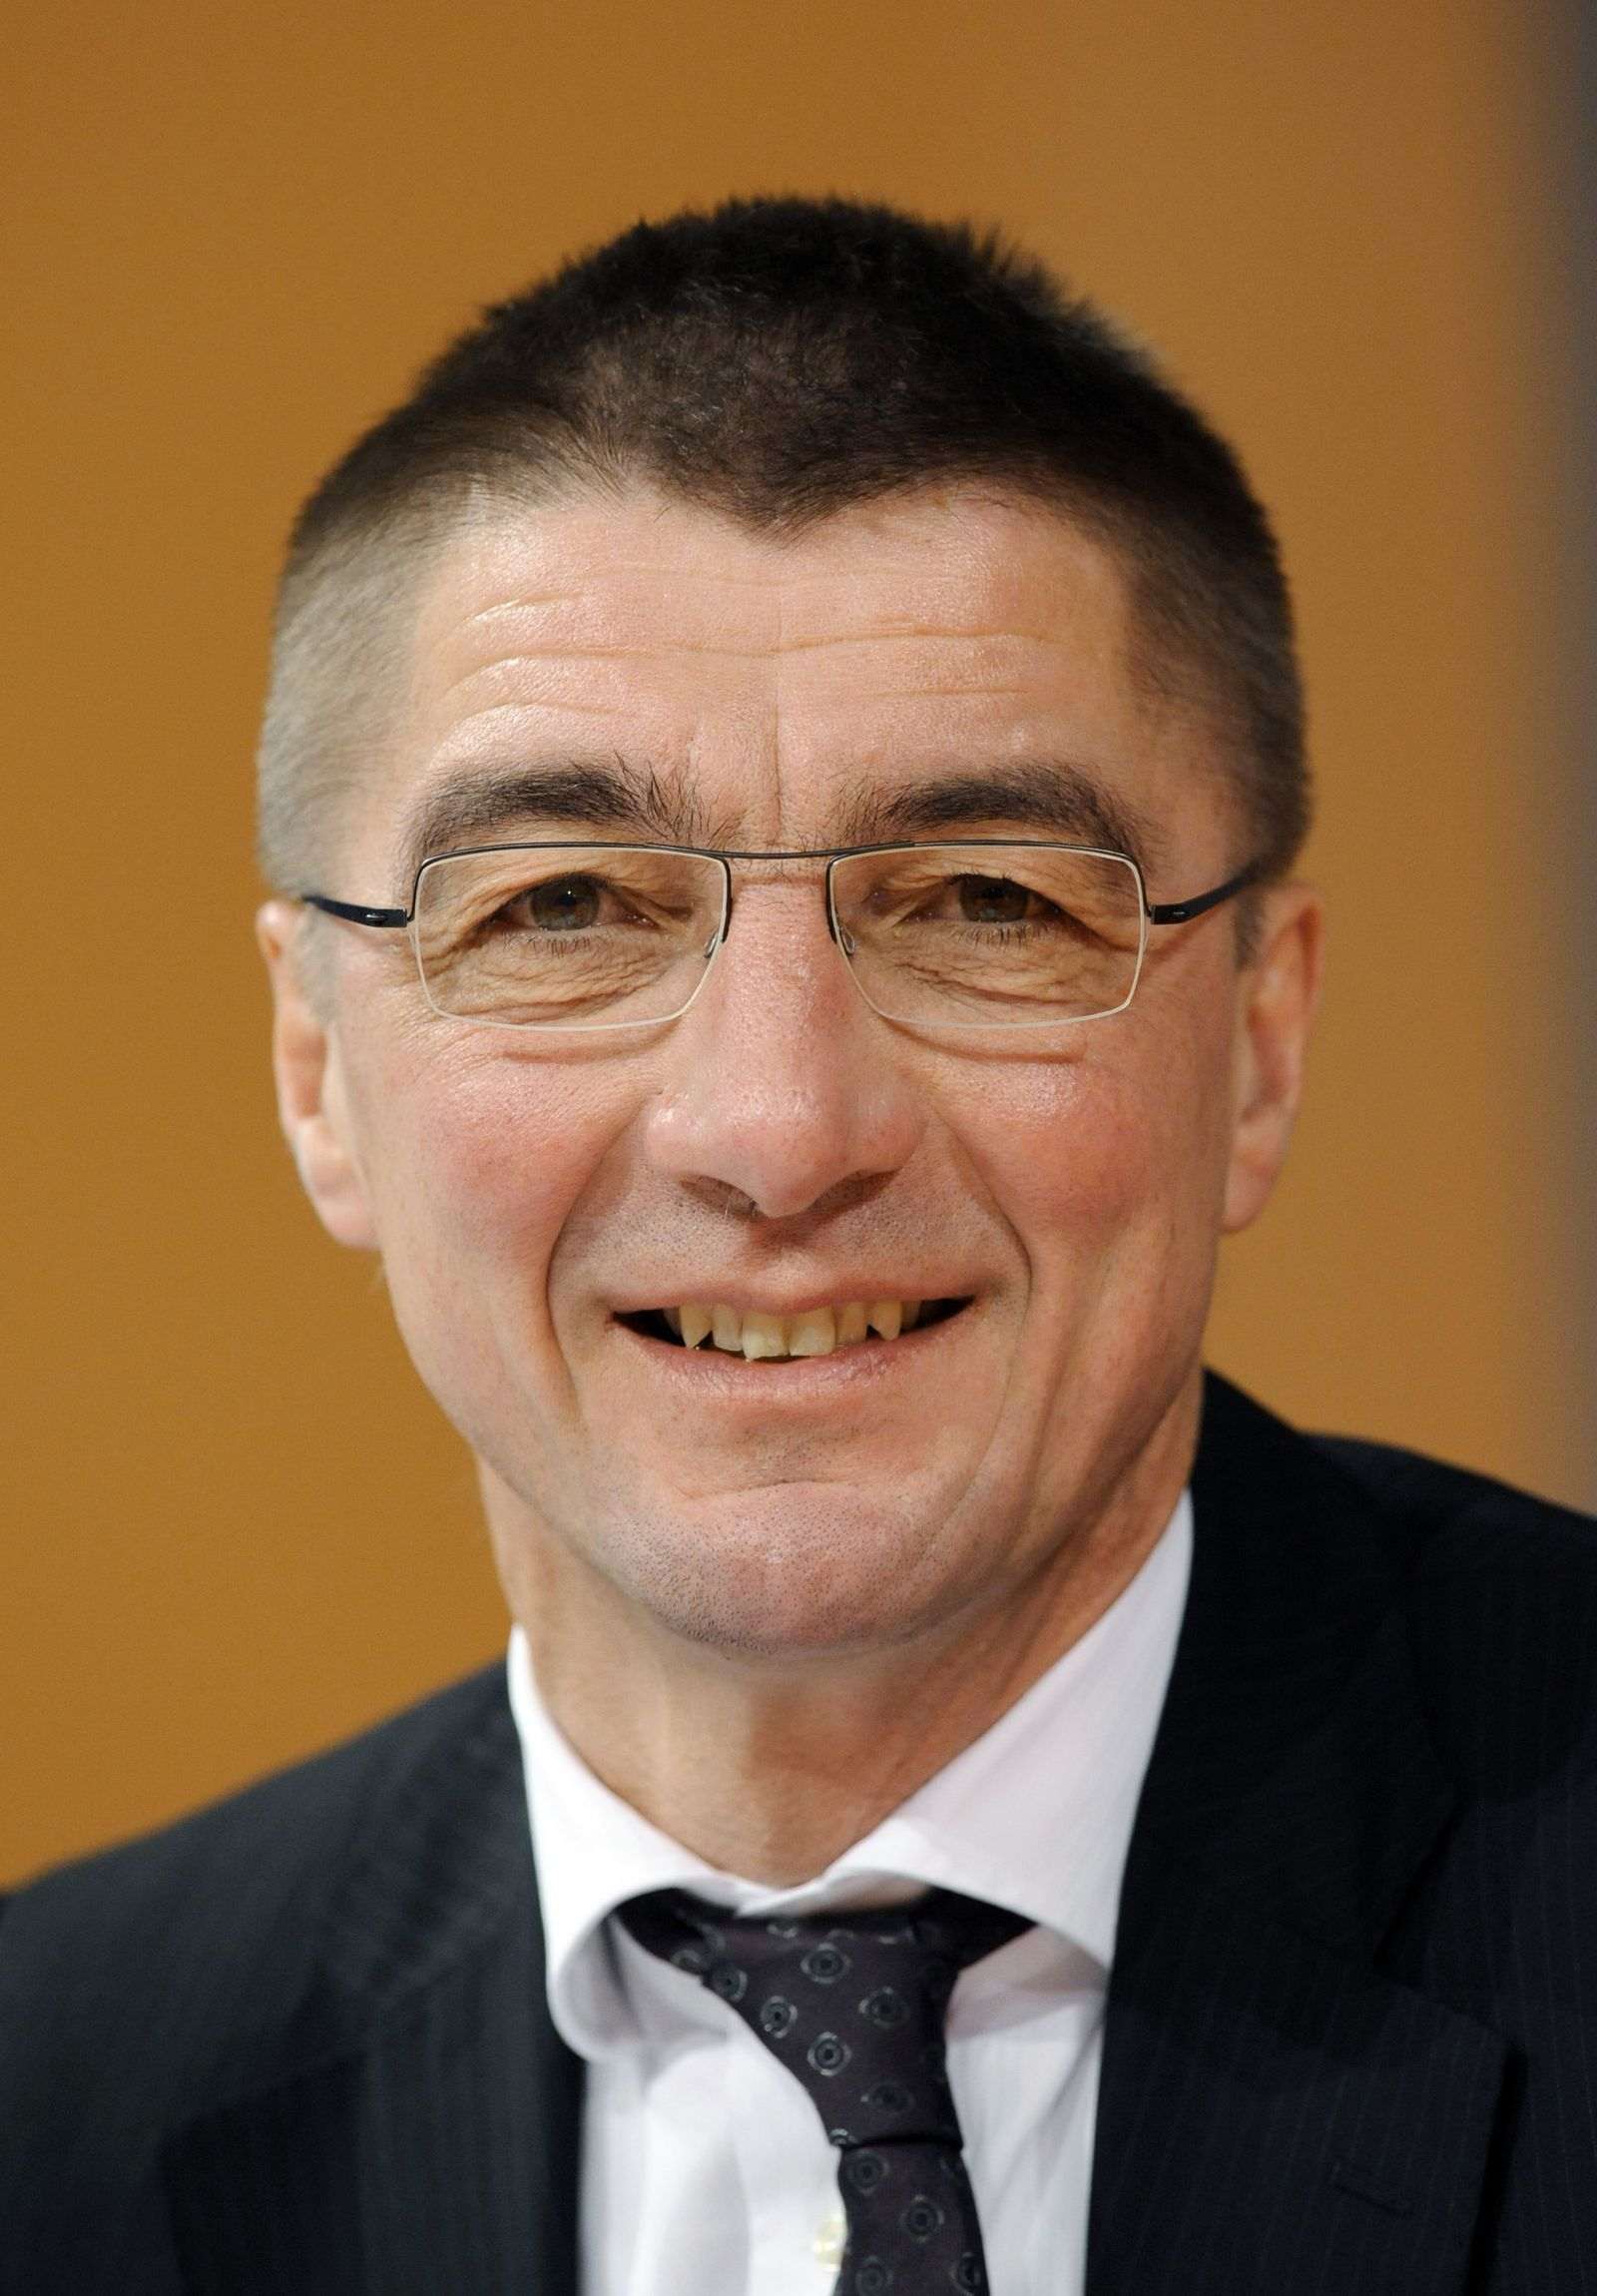 Andreas Schockenhof